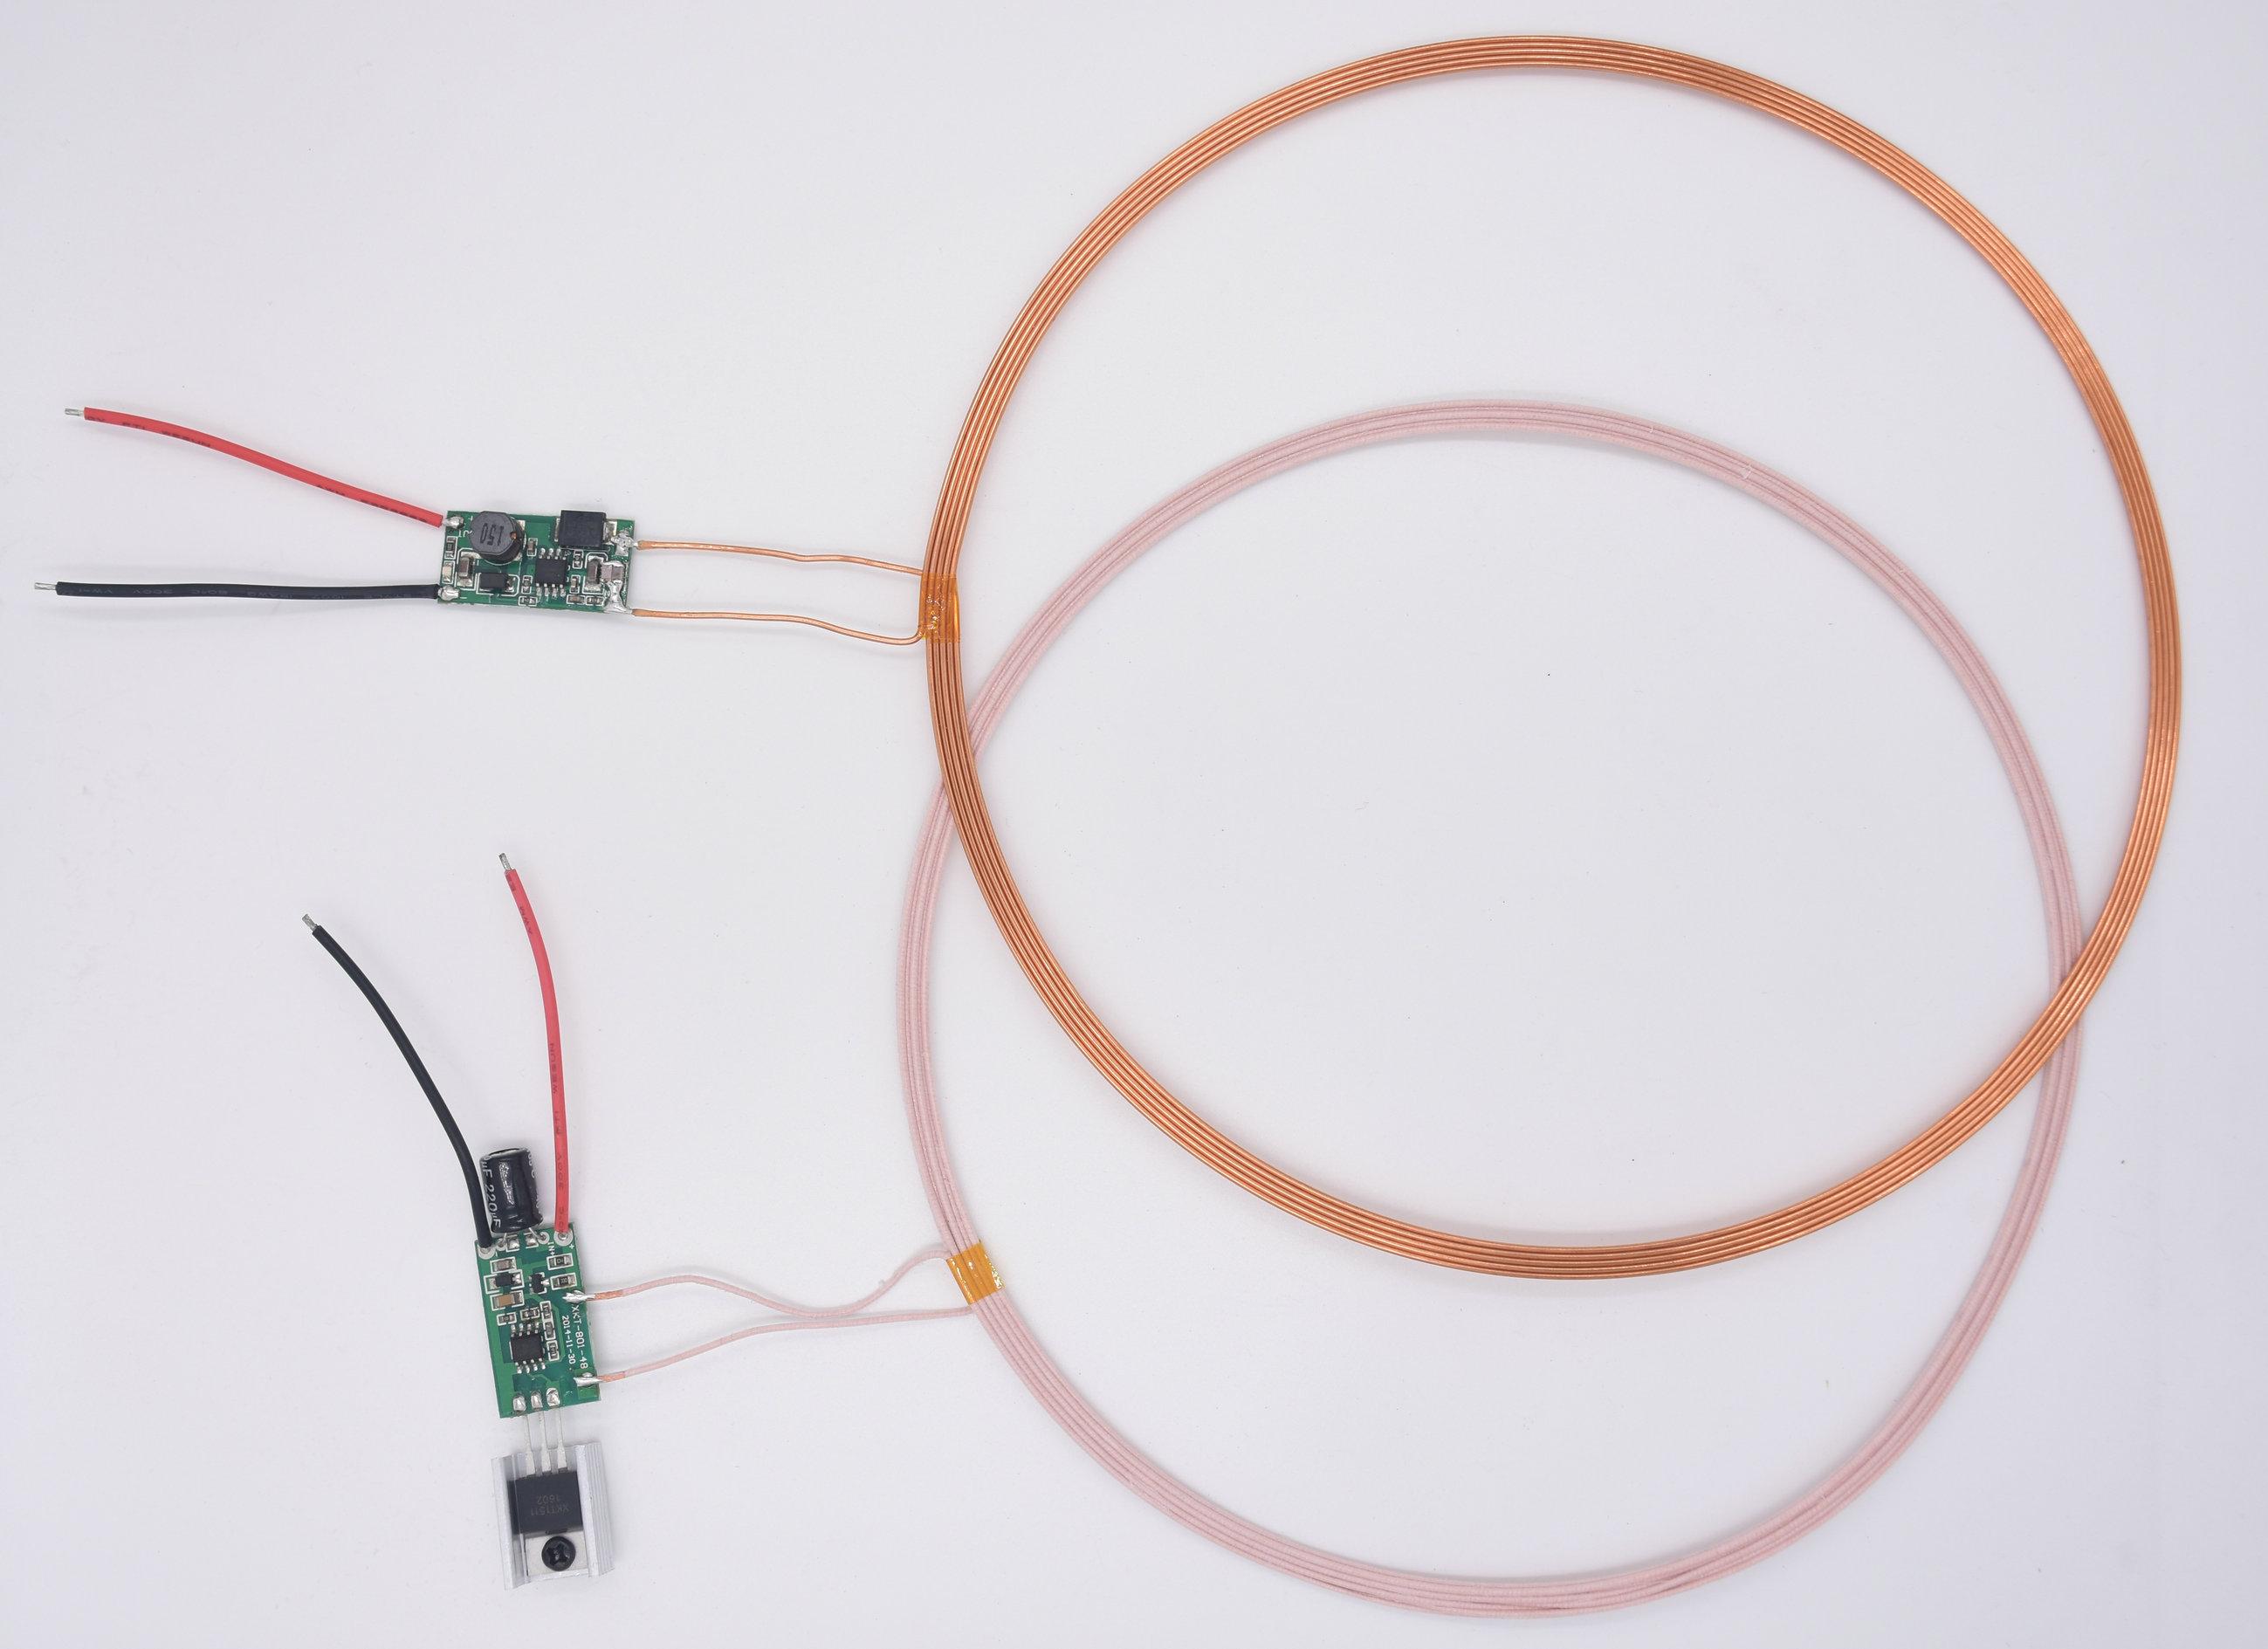 50mm Distance Output 5V 1.1A Long Distance High Current Wireless Charging Module XKT801-12